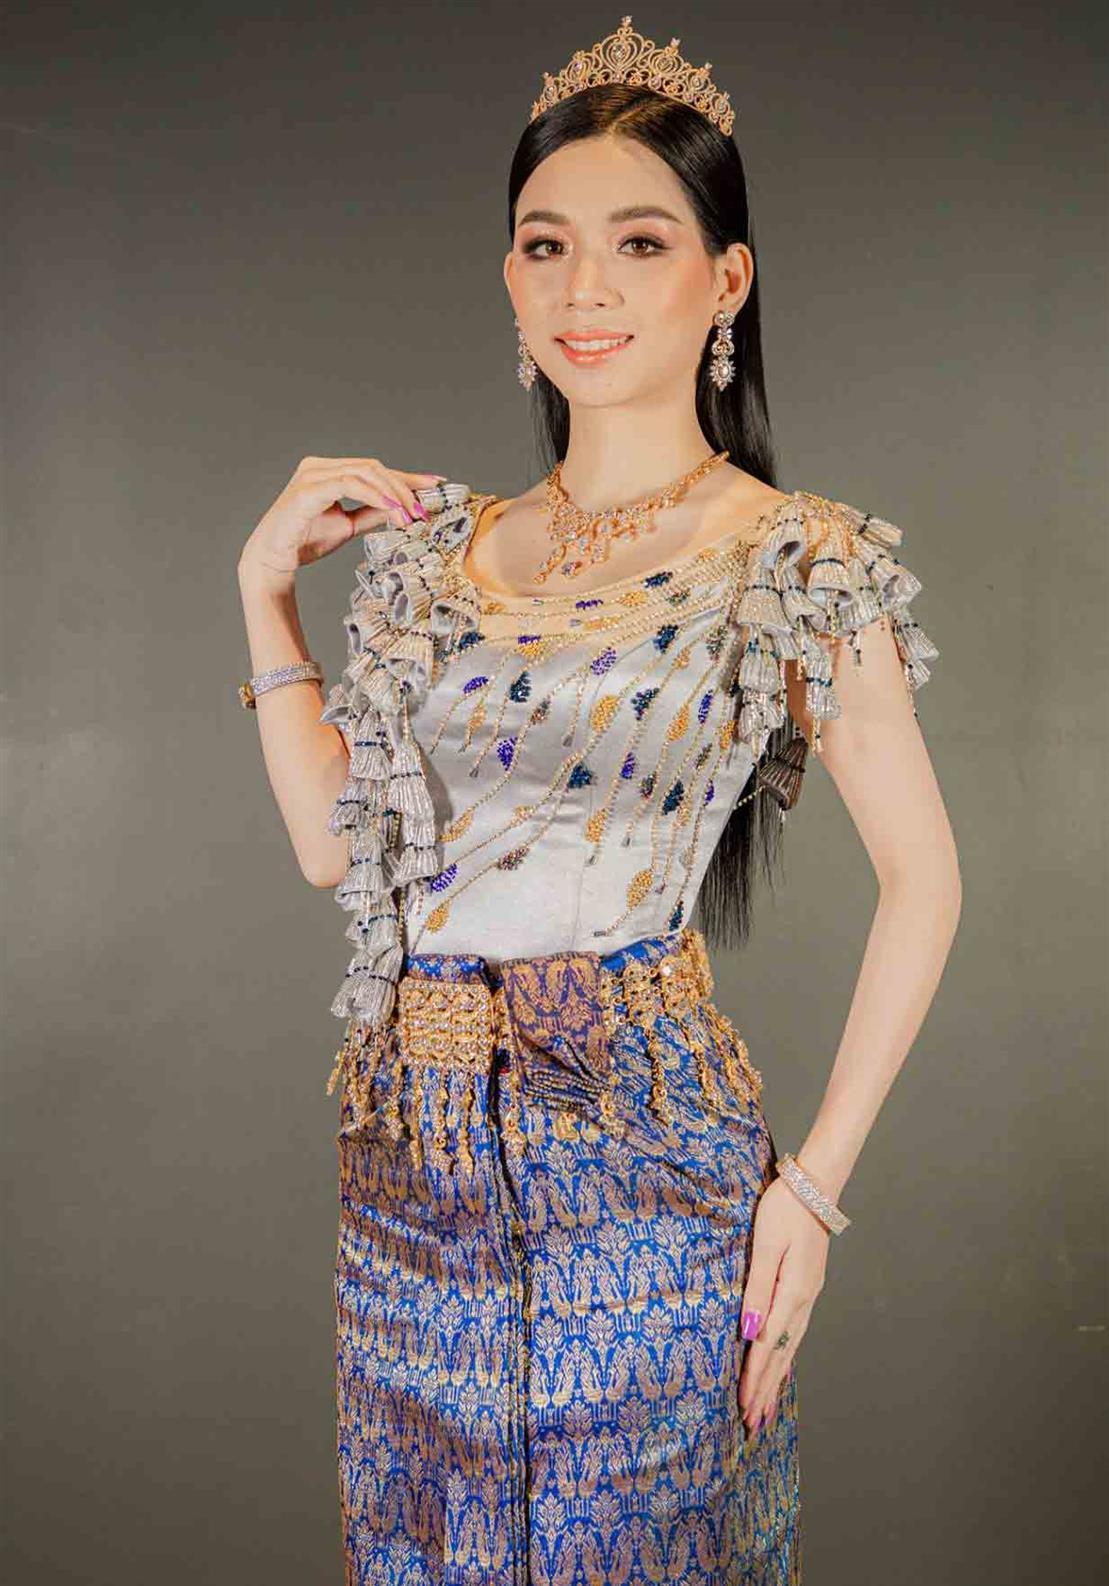 Miss Grand Preah Sihanouk 2020 Lim Sotheavy